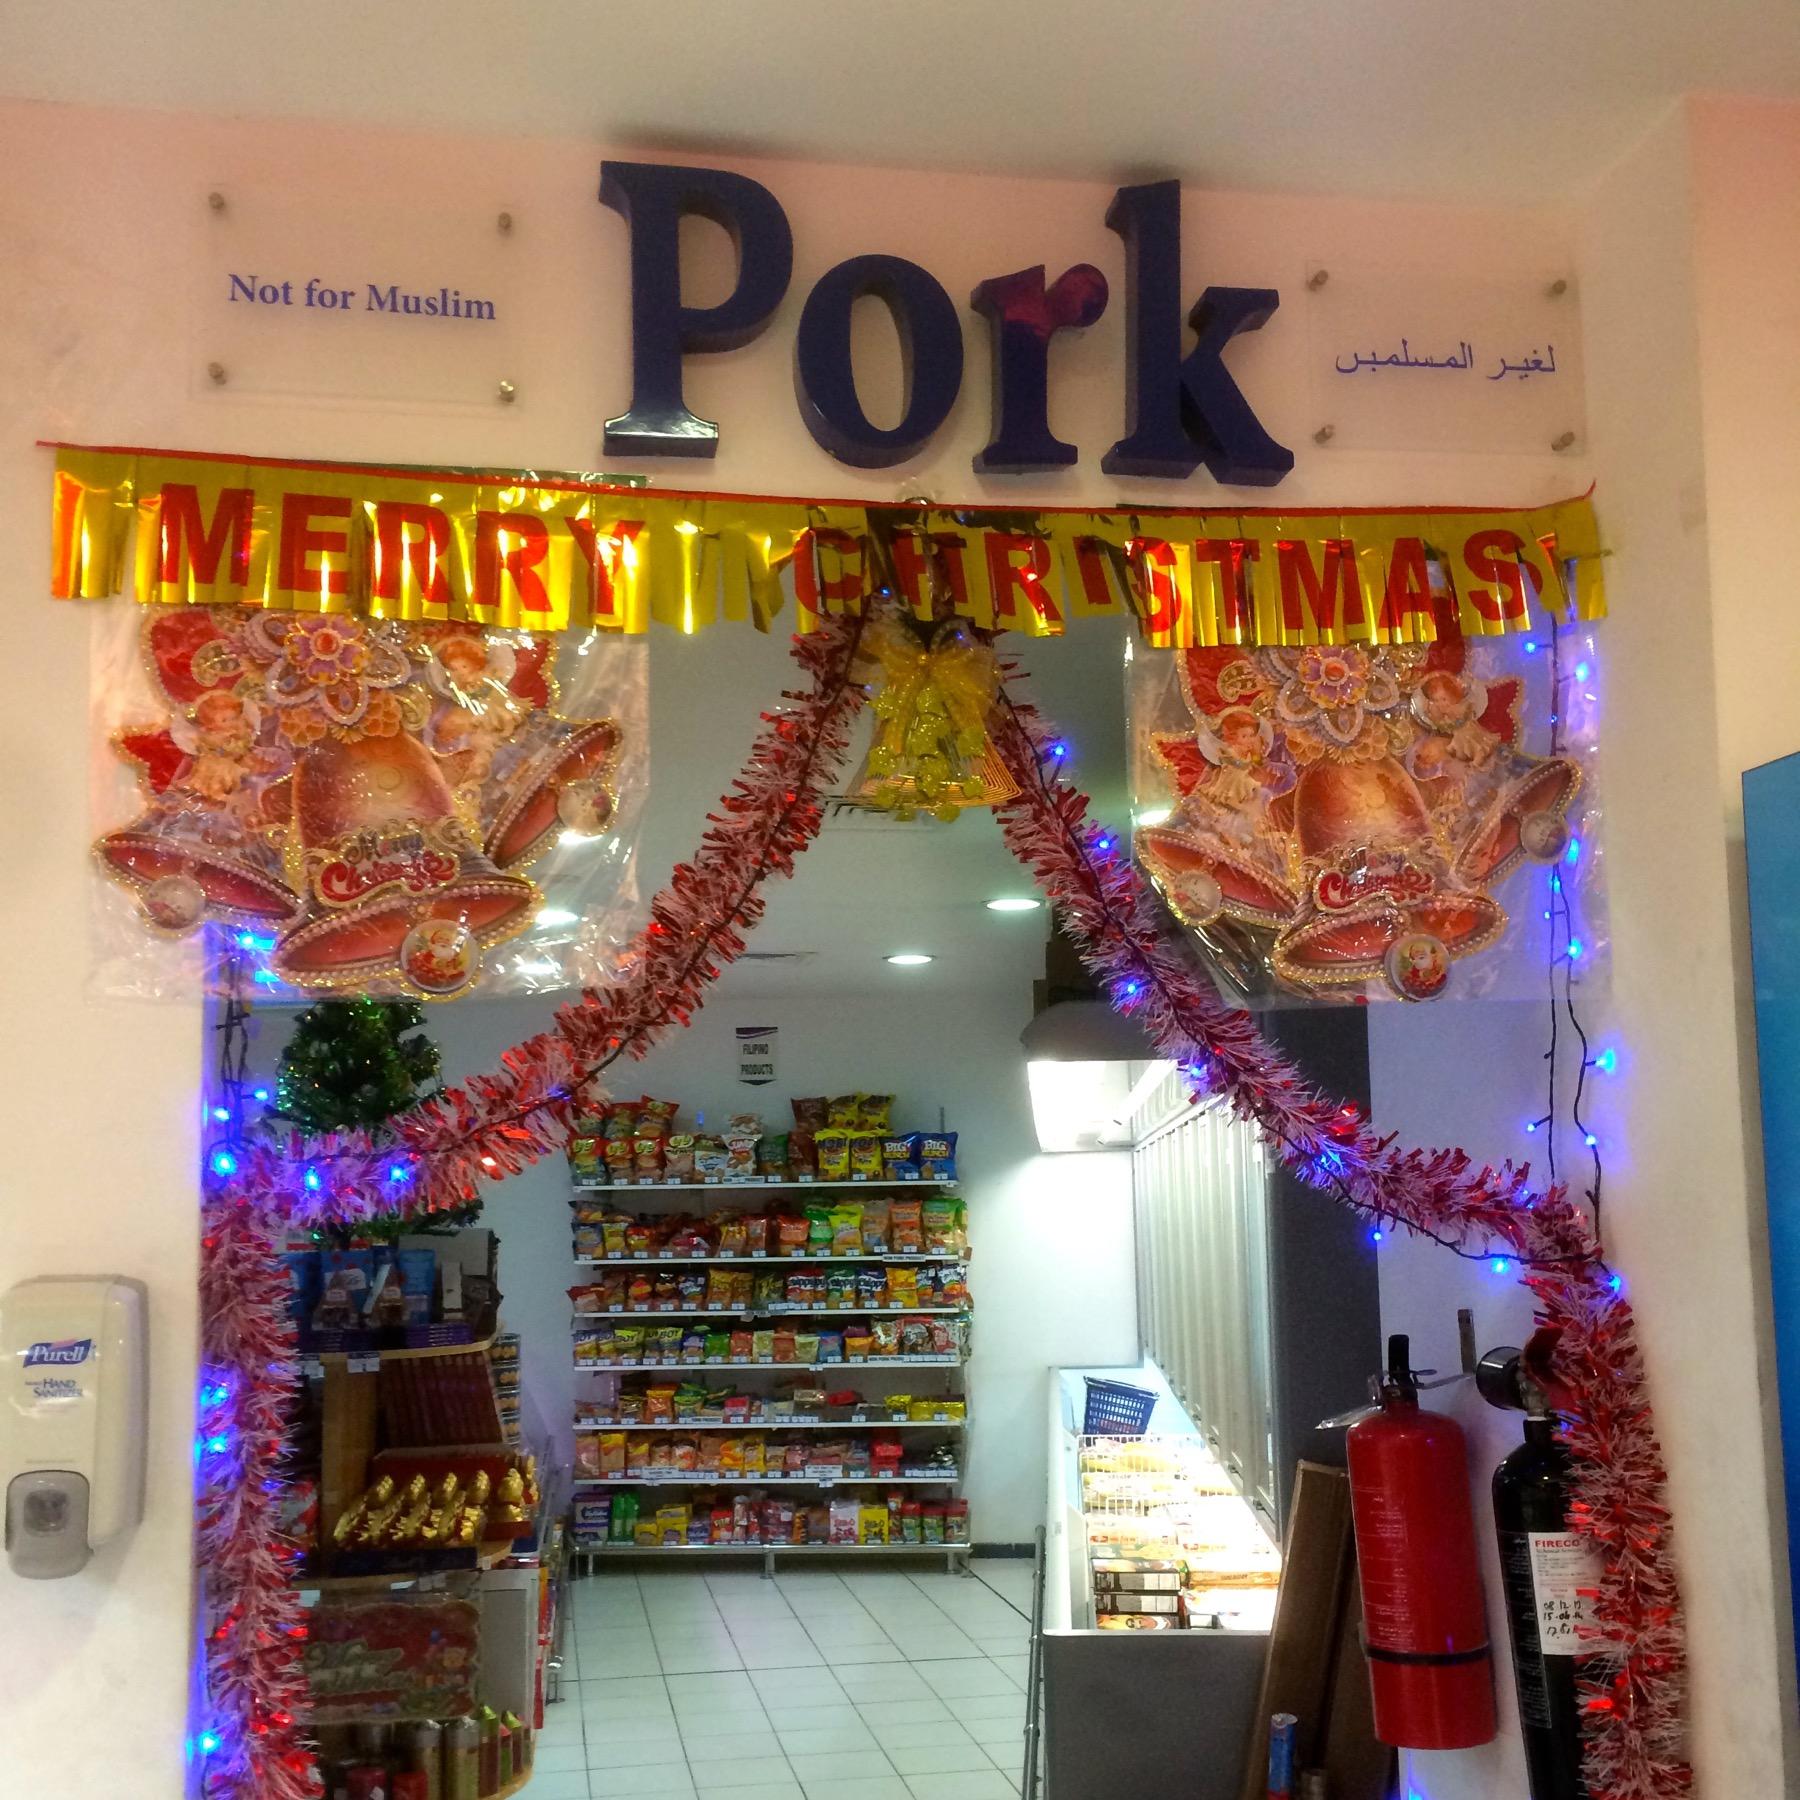 Porky Christmas